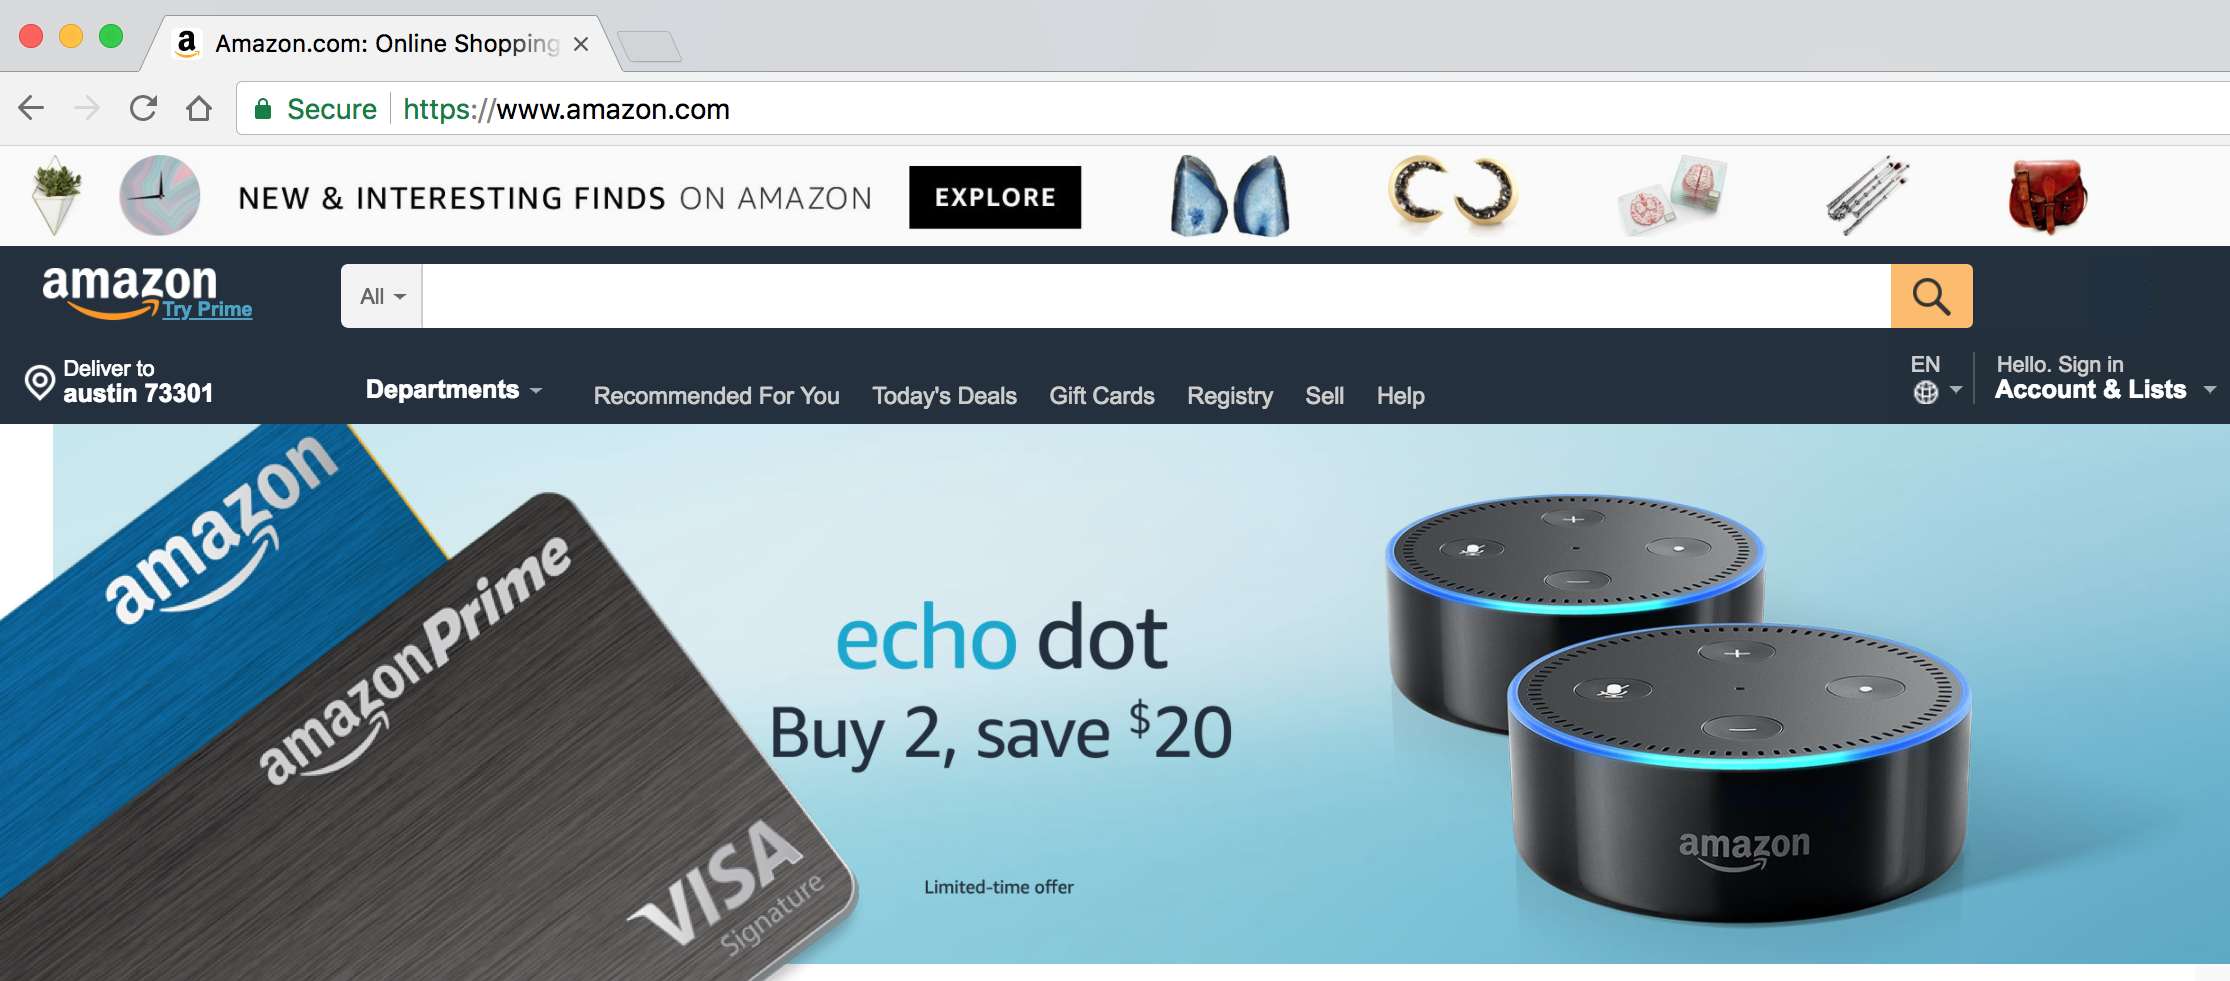 Amazon Credit Cards - Amazon Rewards vs The Prime Rewards Card [8]